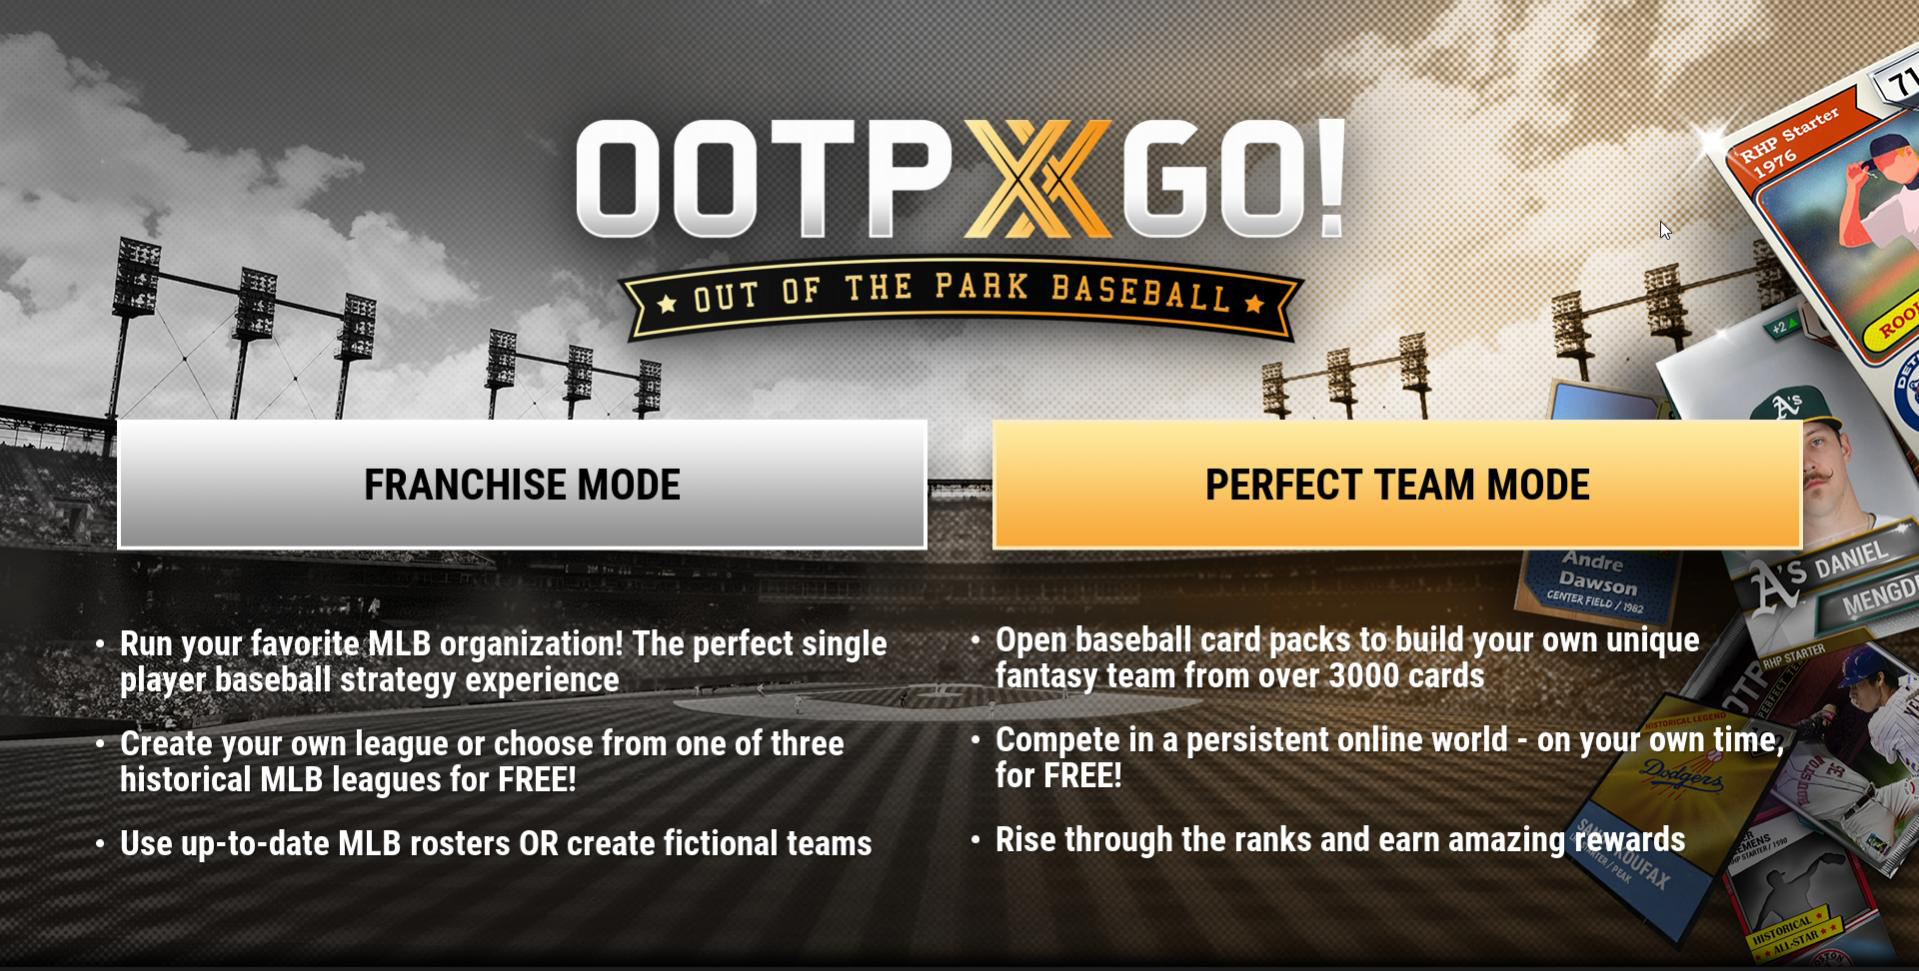 OOTP Baseball Go